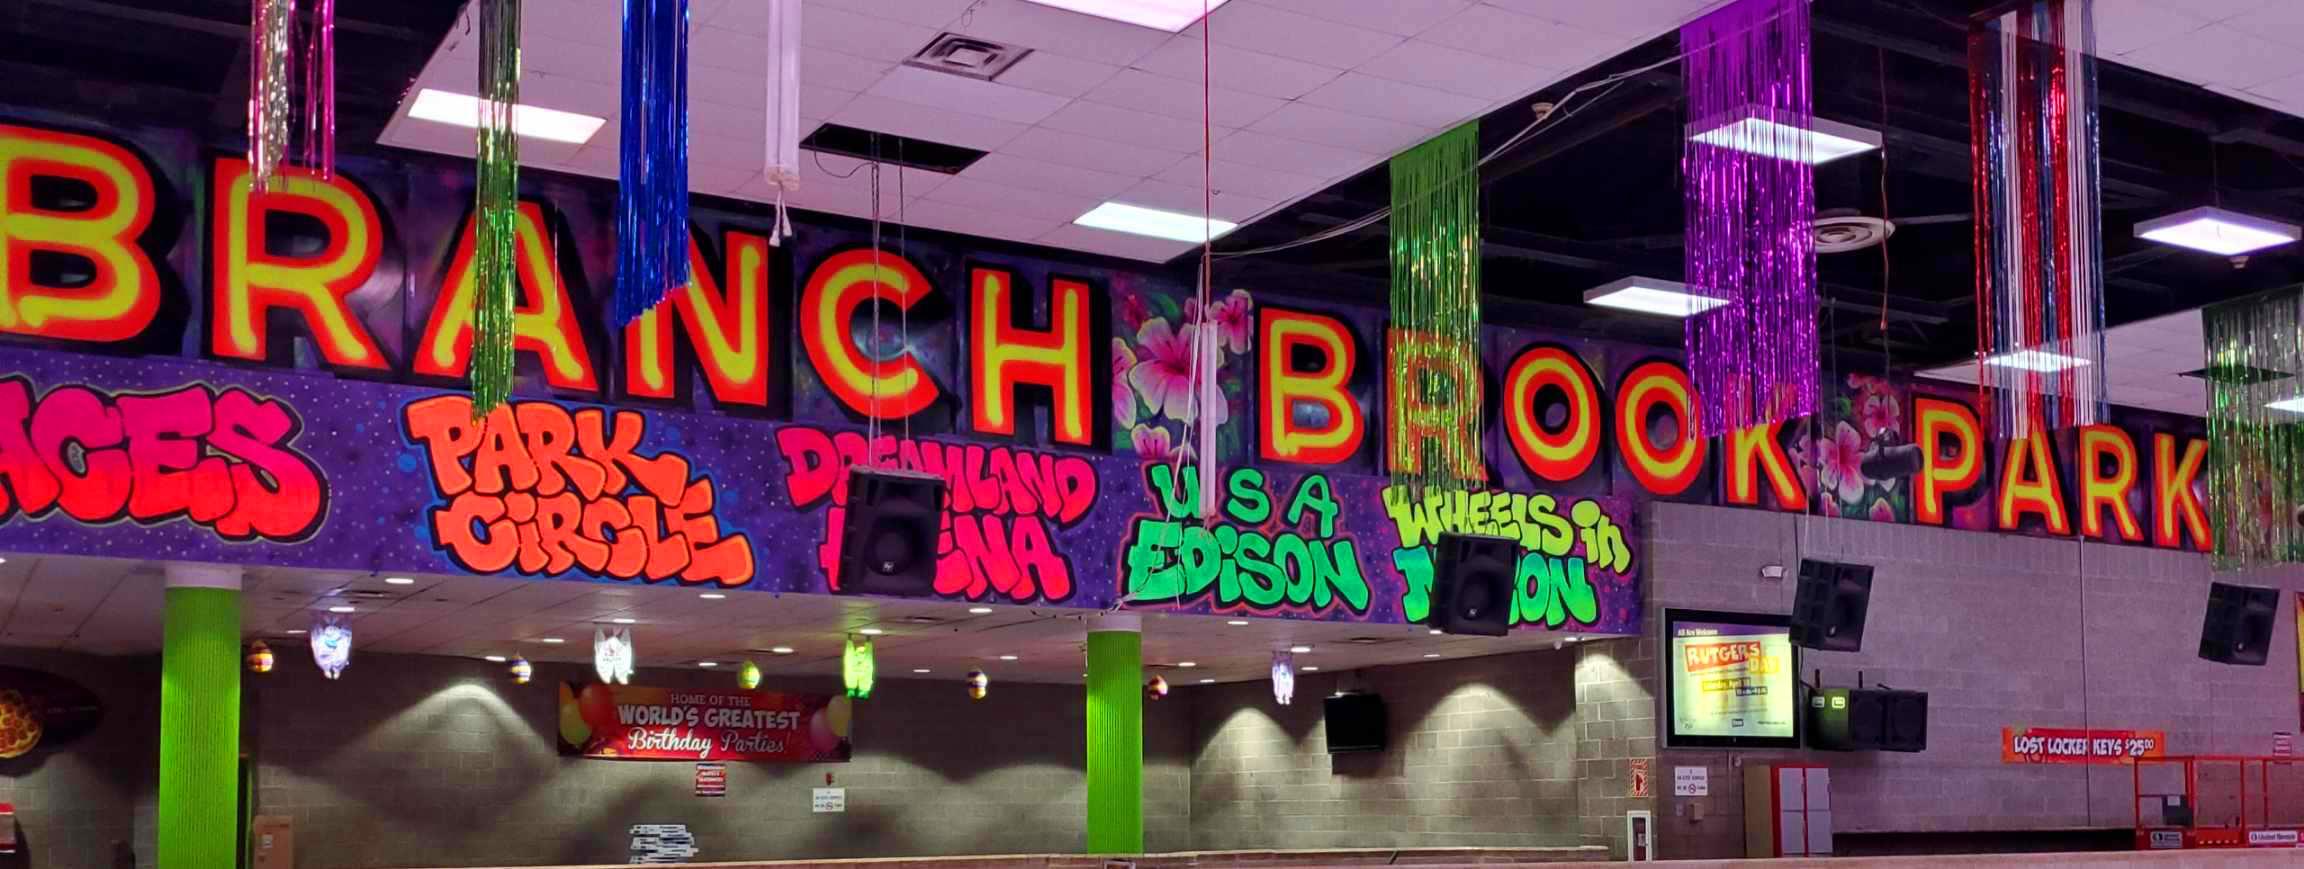 Welcome To Branch Brook Park Roller Skating Center! | Photos pertaining to Branch Brook Park Roller Skating Center